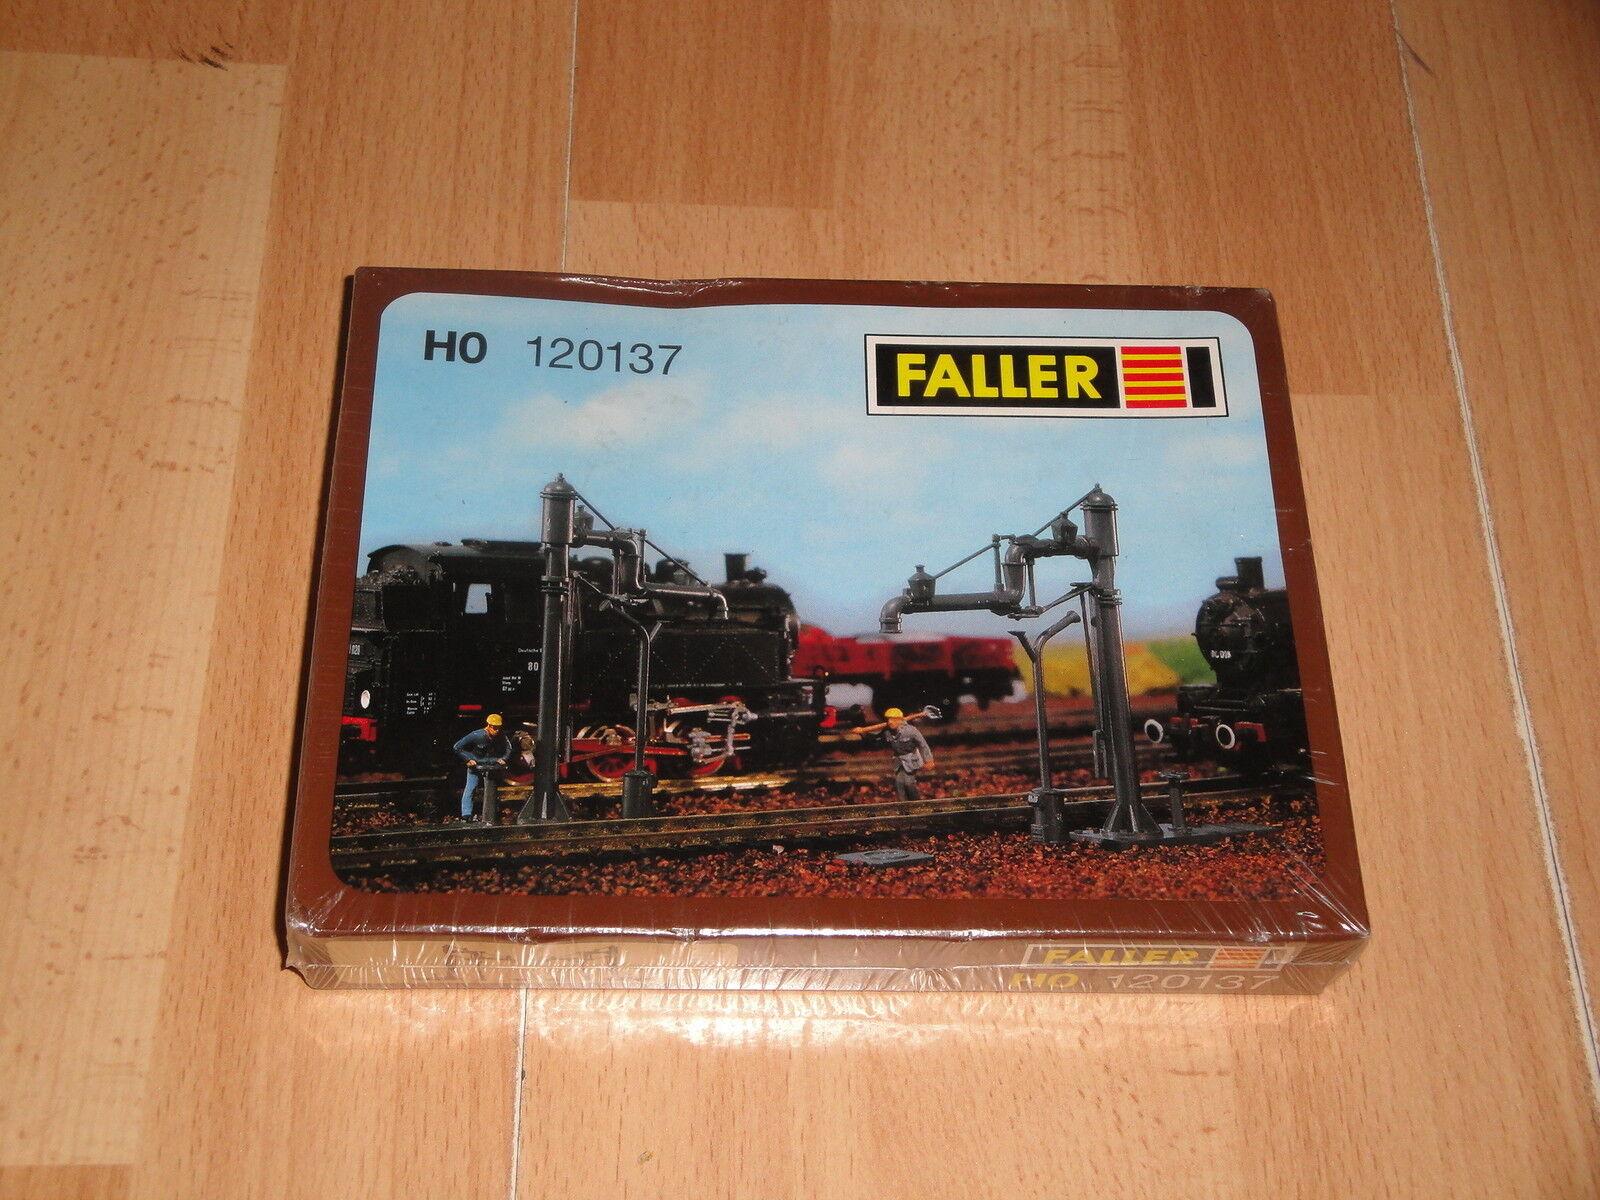 2 SWIVEL WATER CRANES BY FALLER FALLER FALLER HO 120137 MADE IN GERMANY NEW FACTORY SEALED 93e432